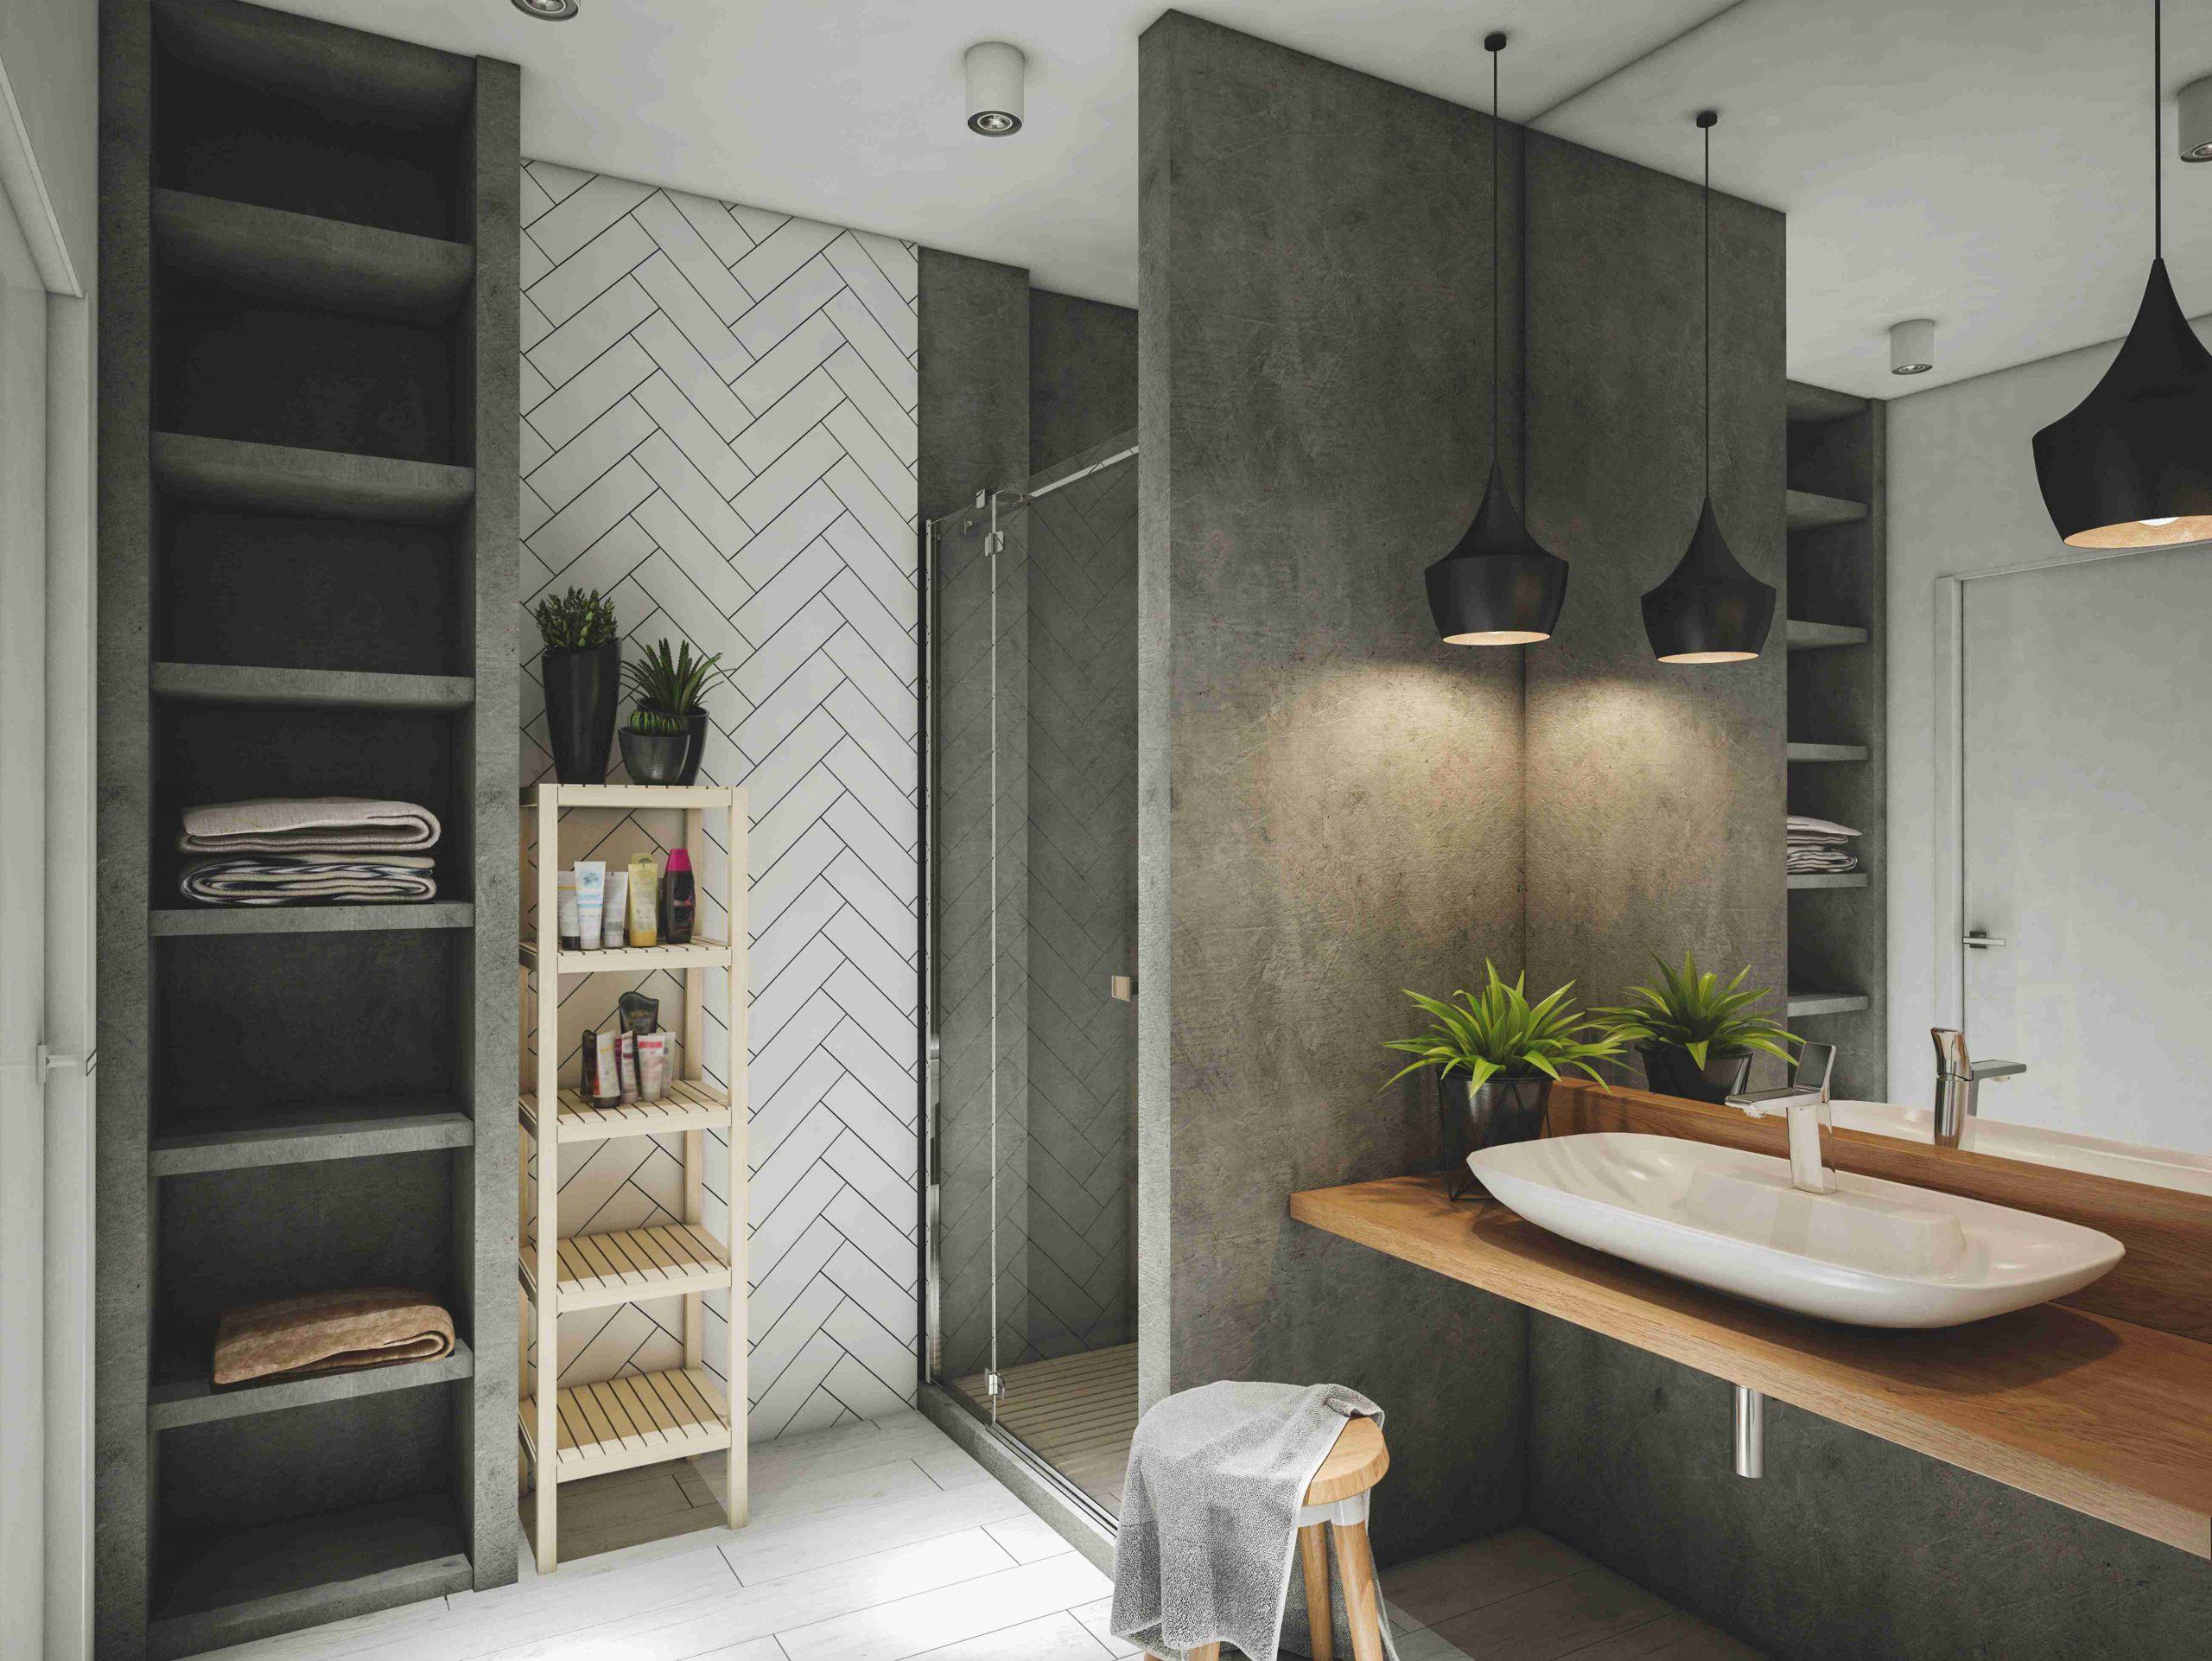 small-bathroom-remodel-London-small-bathroom-renovations-London